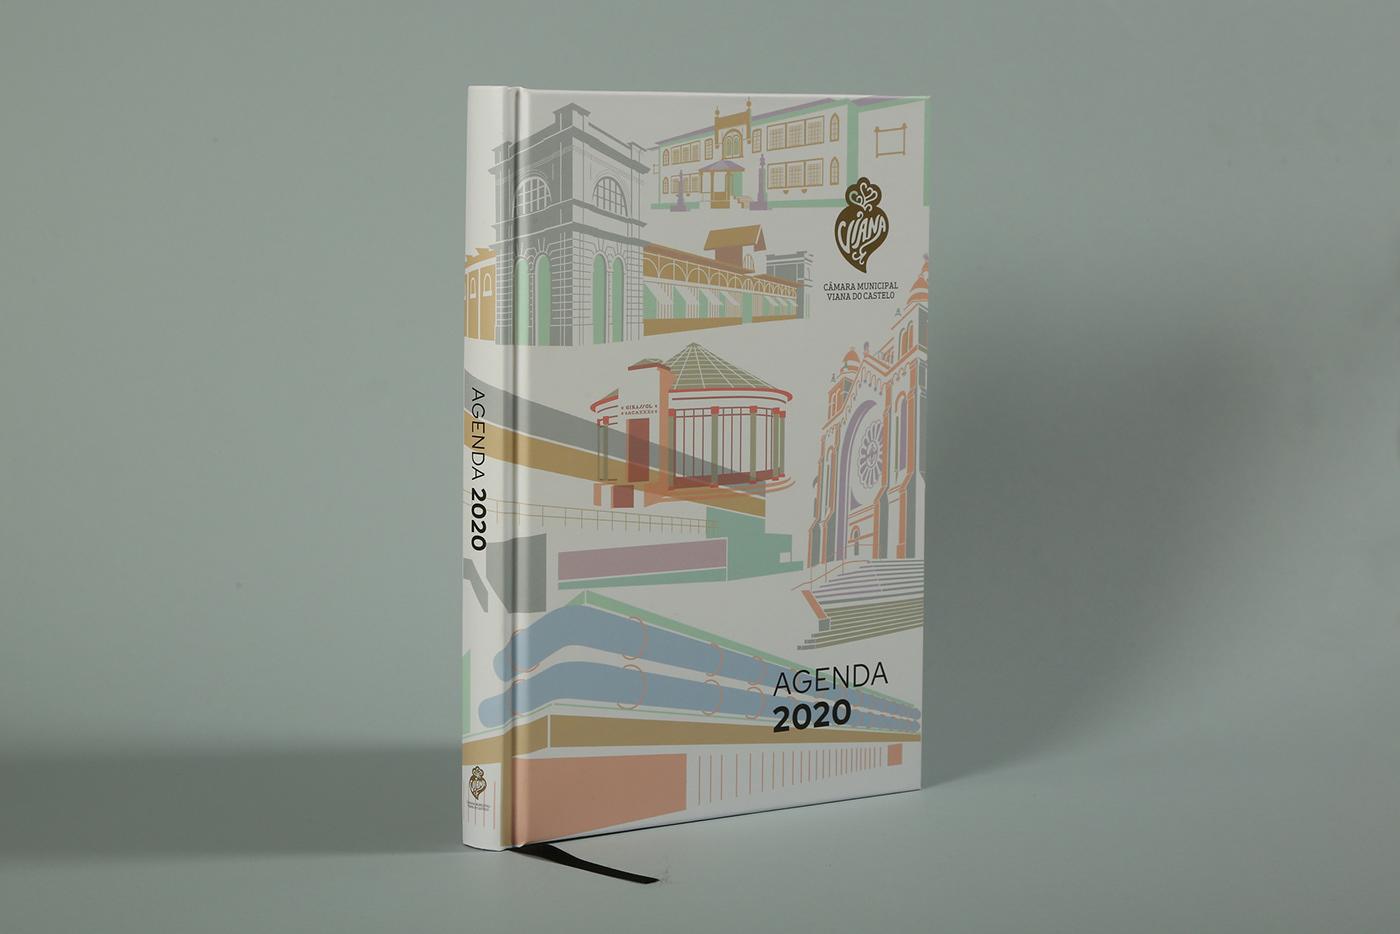 agenda art direction  Catalogue editorial Exhibition  graphic design  ILLUSTRATION  architects architecture